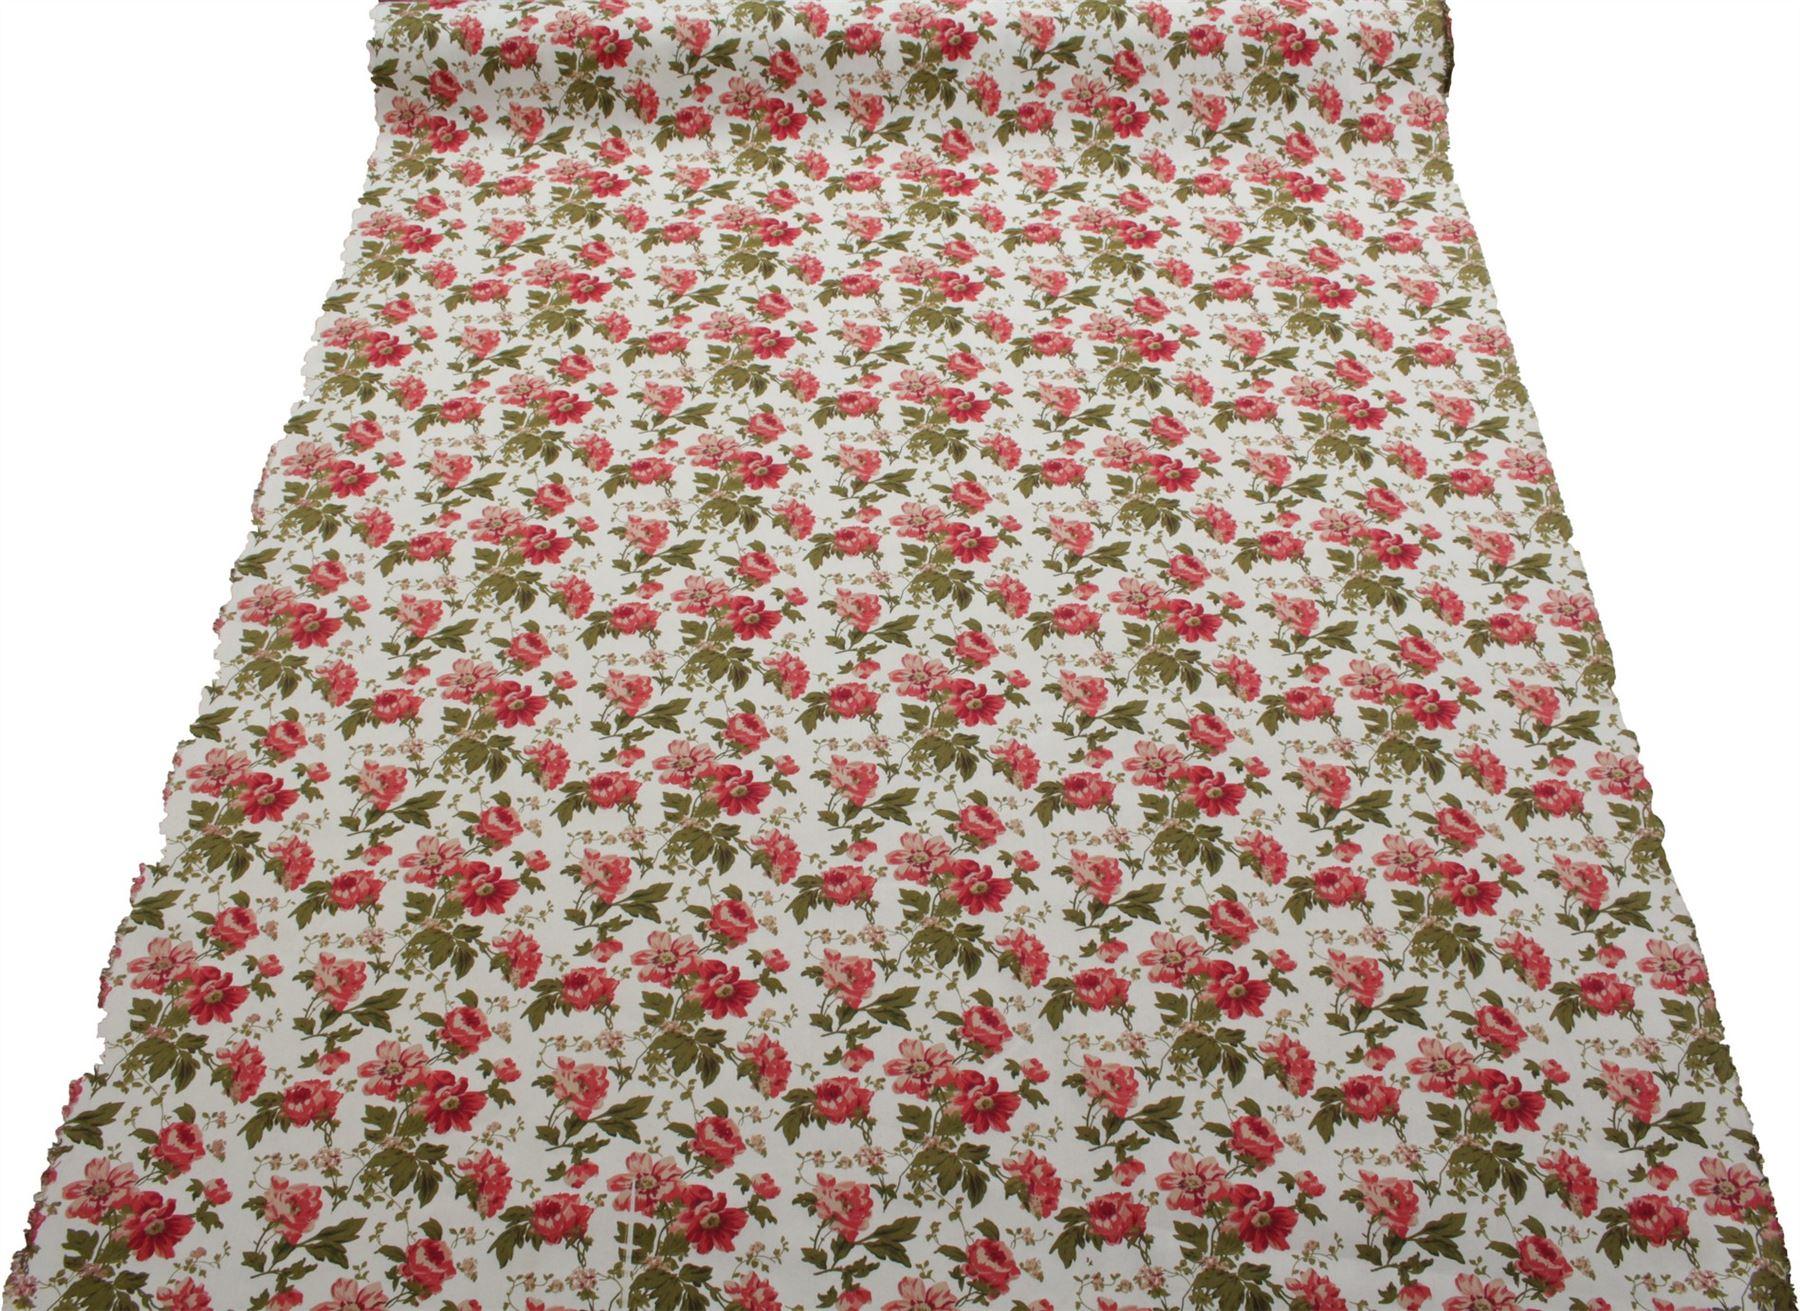 thumbnail 10 - 100% Heavy Cotton Panama Printed Childrens Curtain Cushion Upholstery Fabric